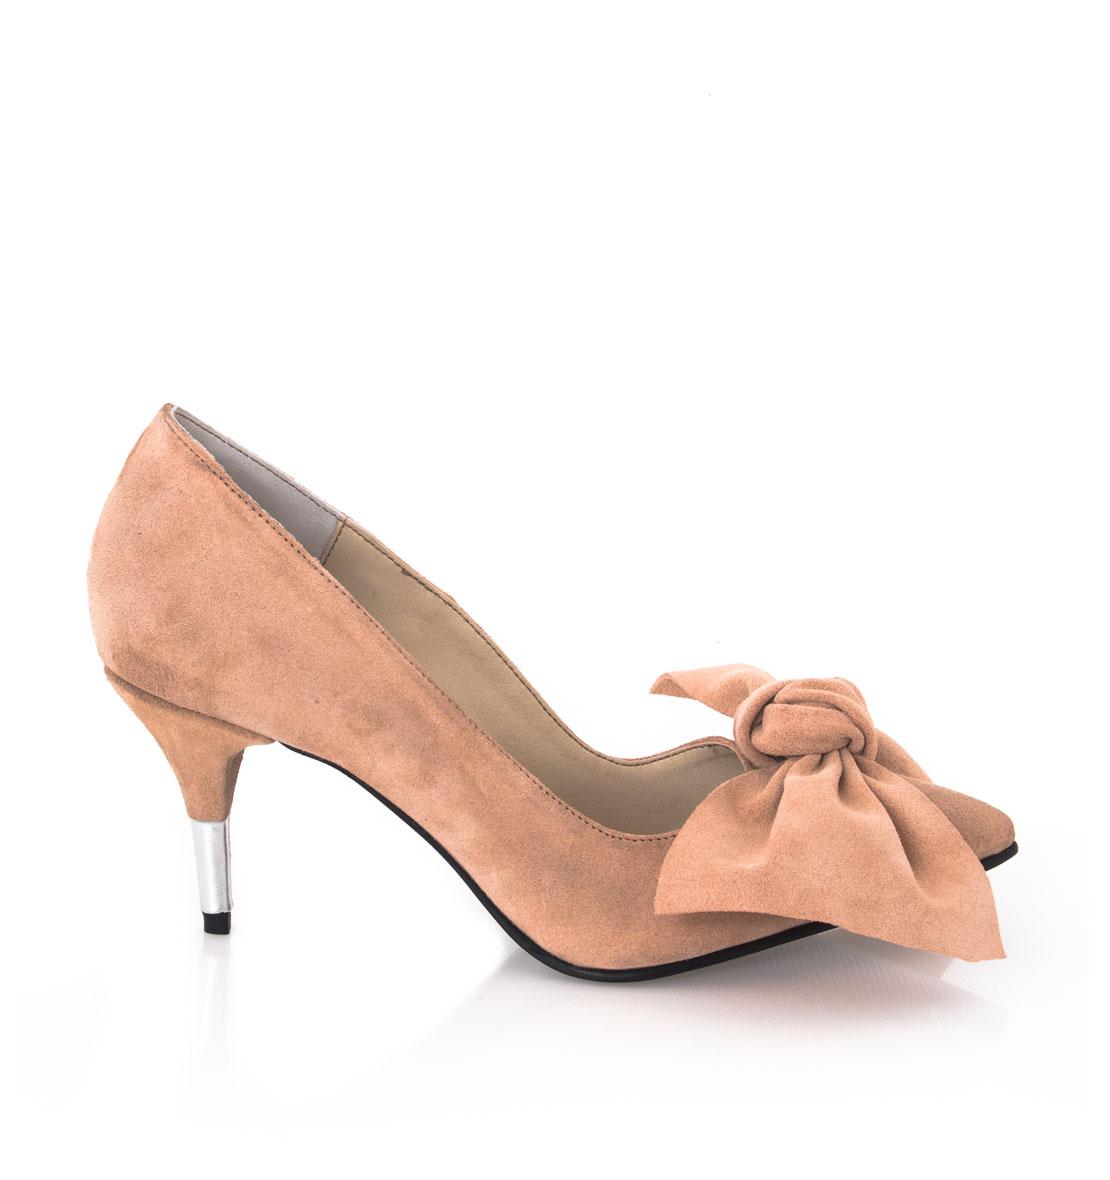 Pantofi Stiletto Roz Pal Piele Intoarsa